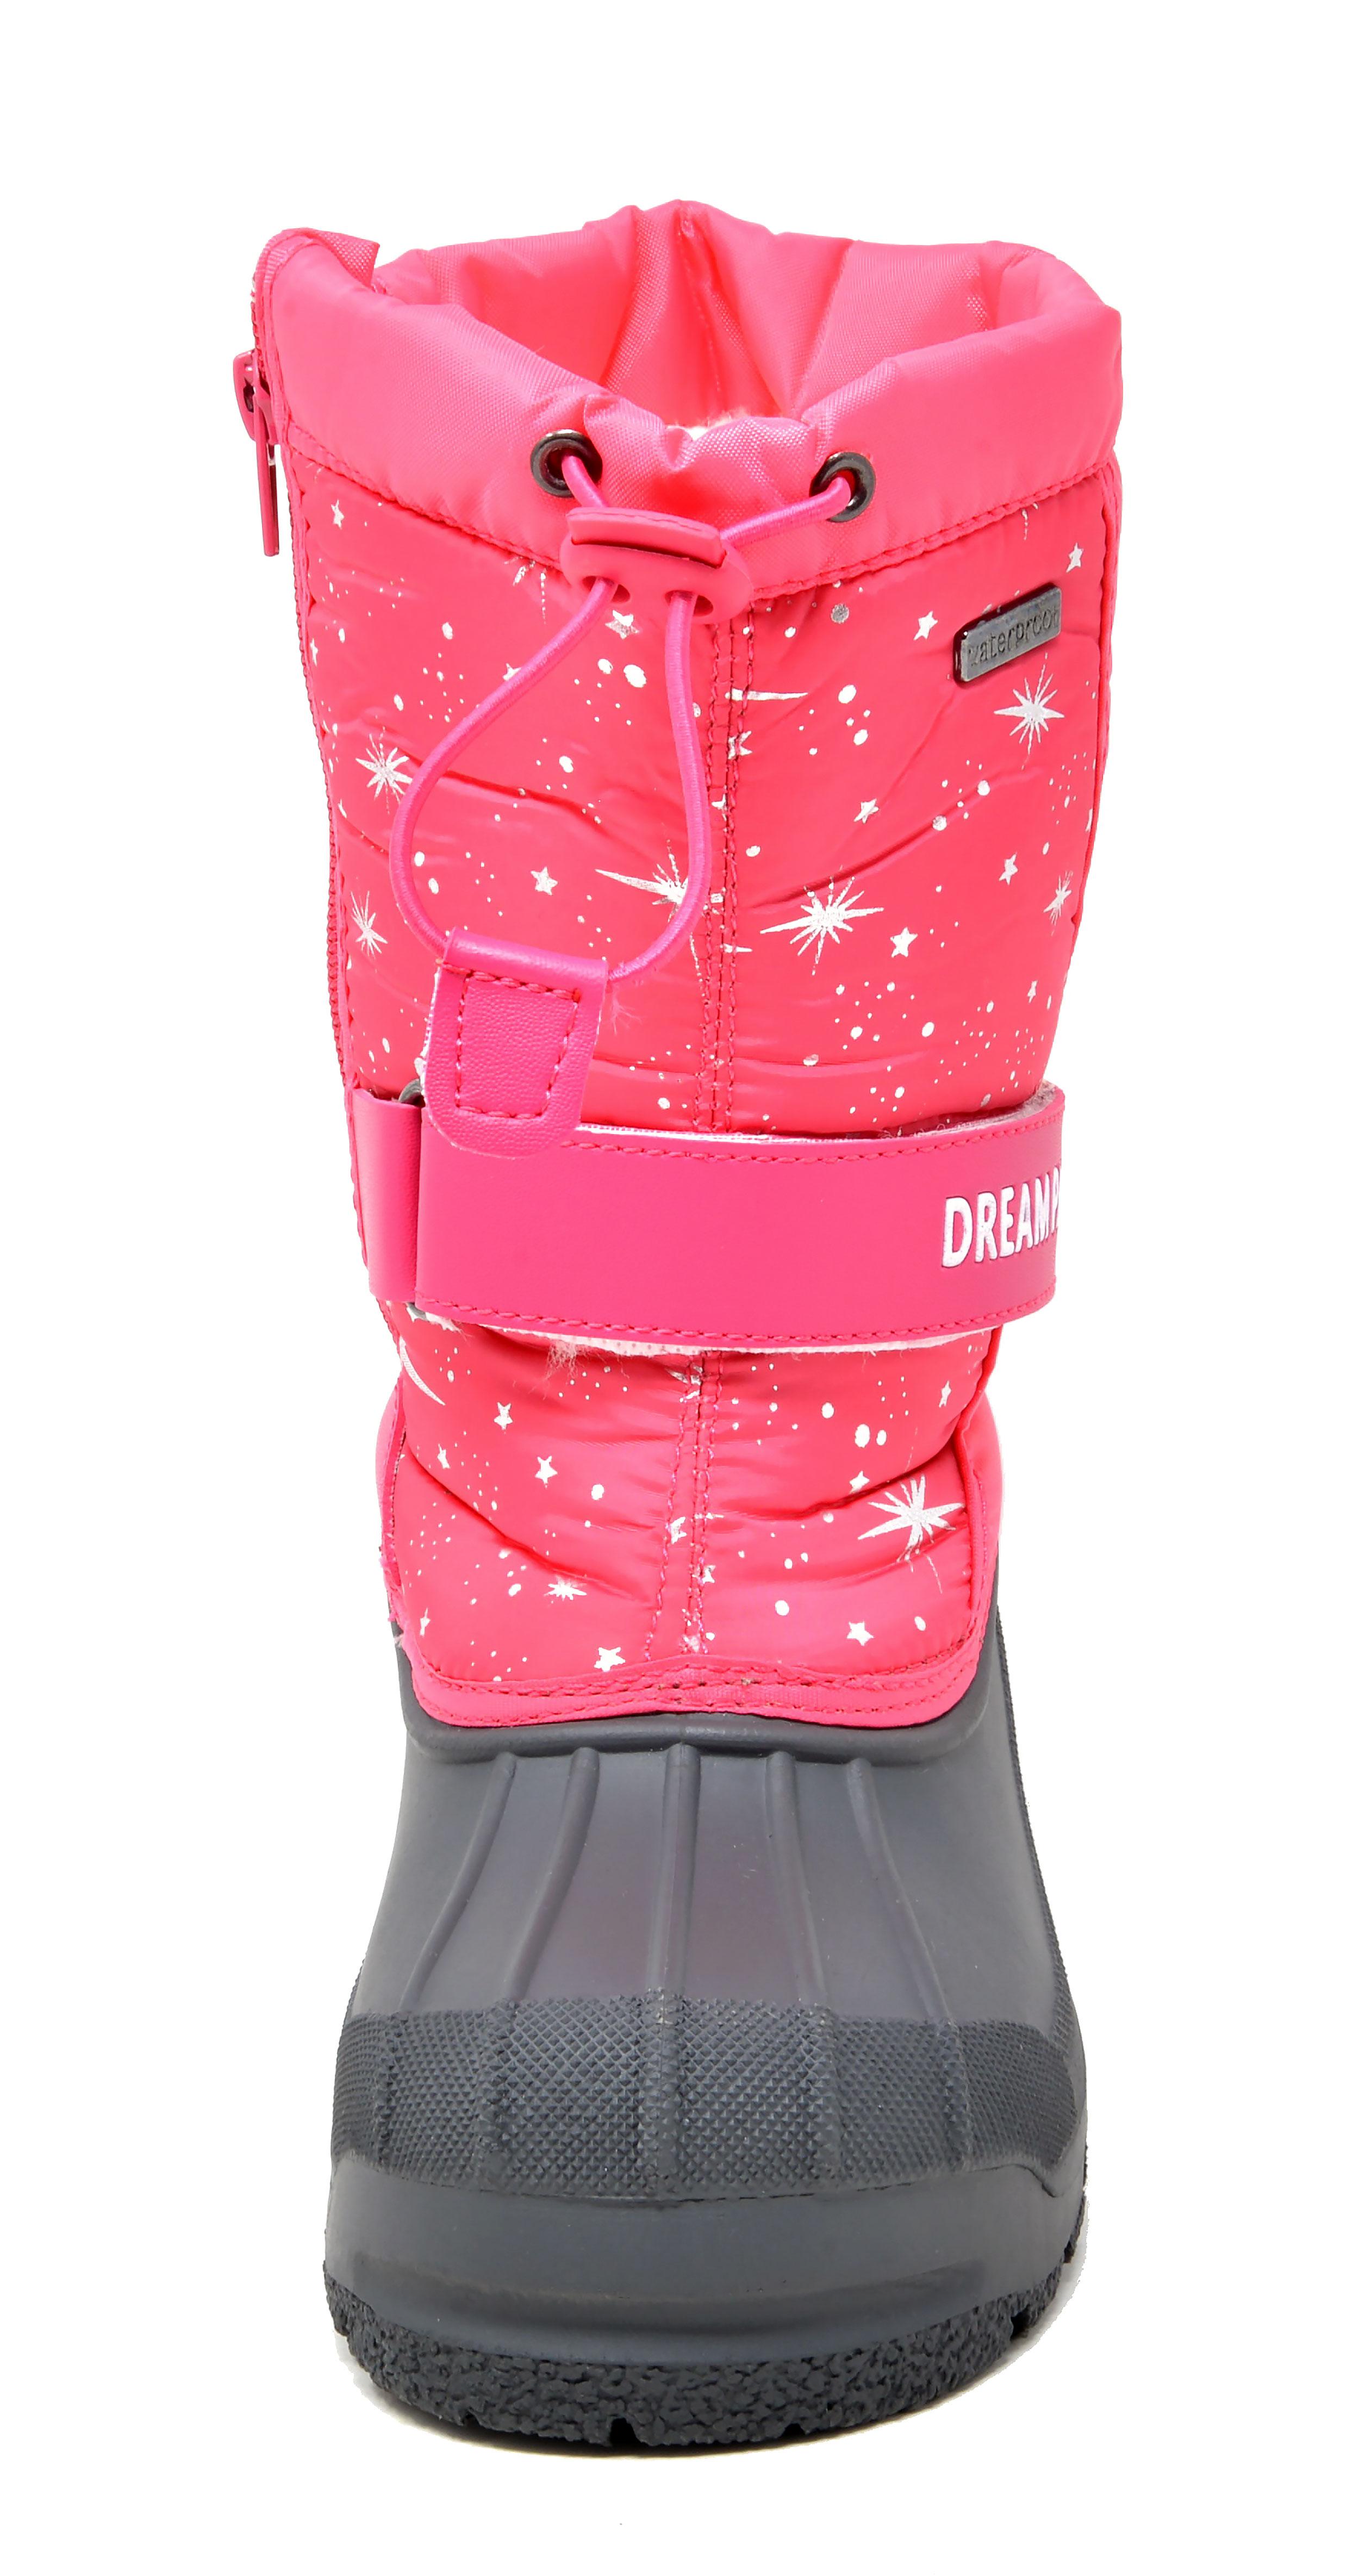 Kids Boys Girls Knee High Winter Insulated Snow Boots Warm Boots